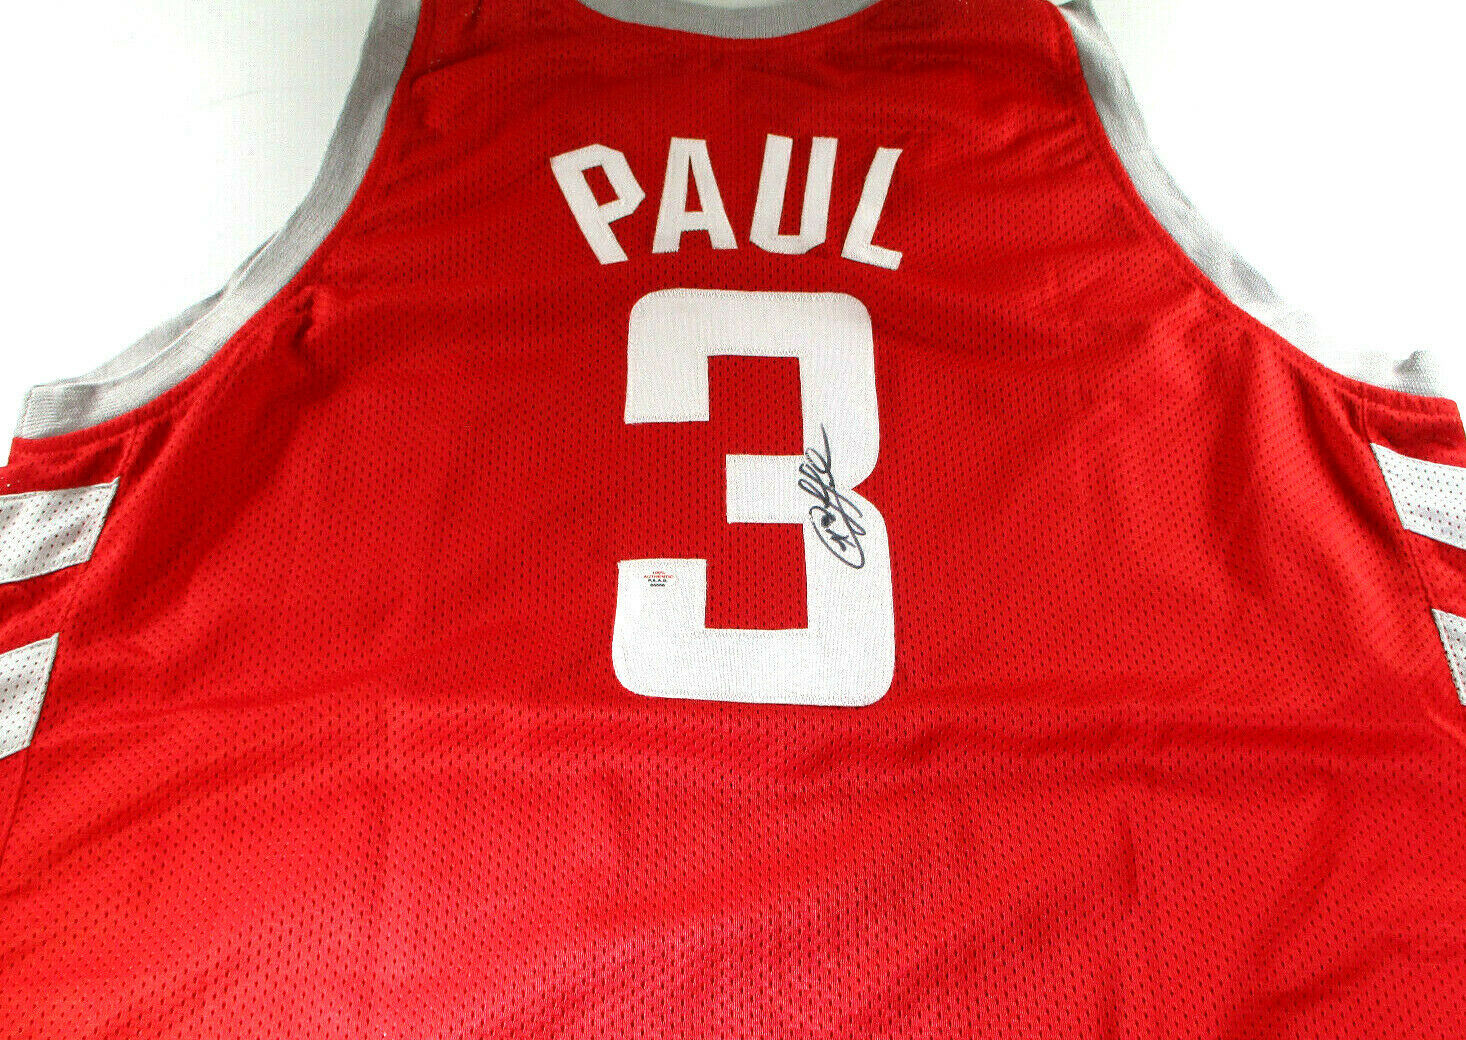 CHRIS PAUL / AUTOGRAPHED HOUSTON ROCKETS RED CUSTOM BASKETBALL JERSEY / COA